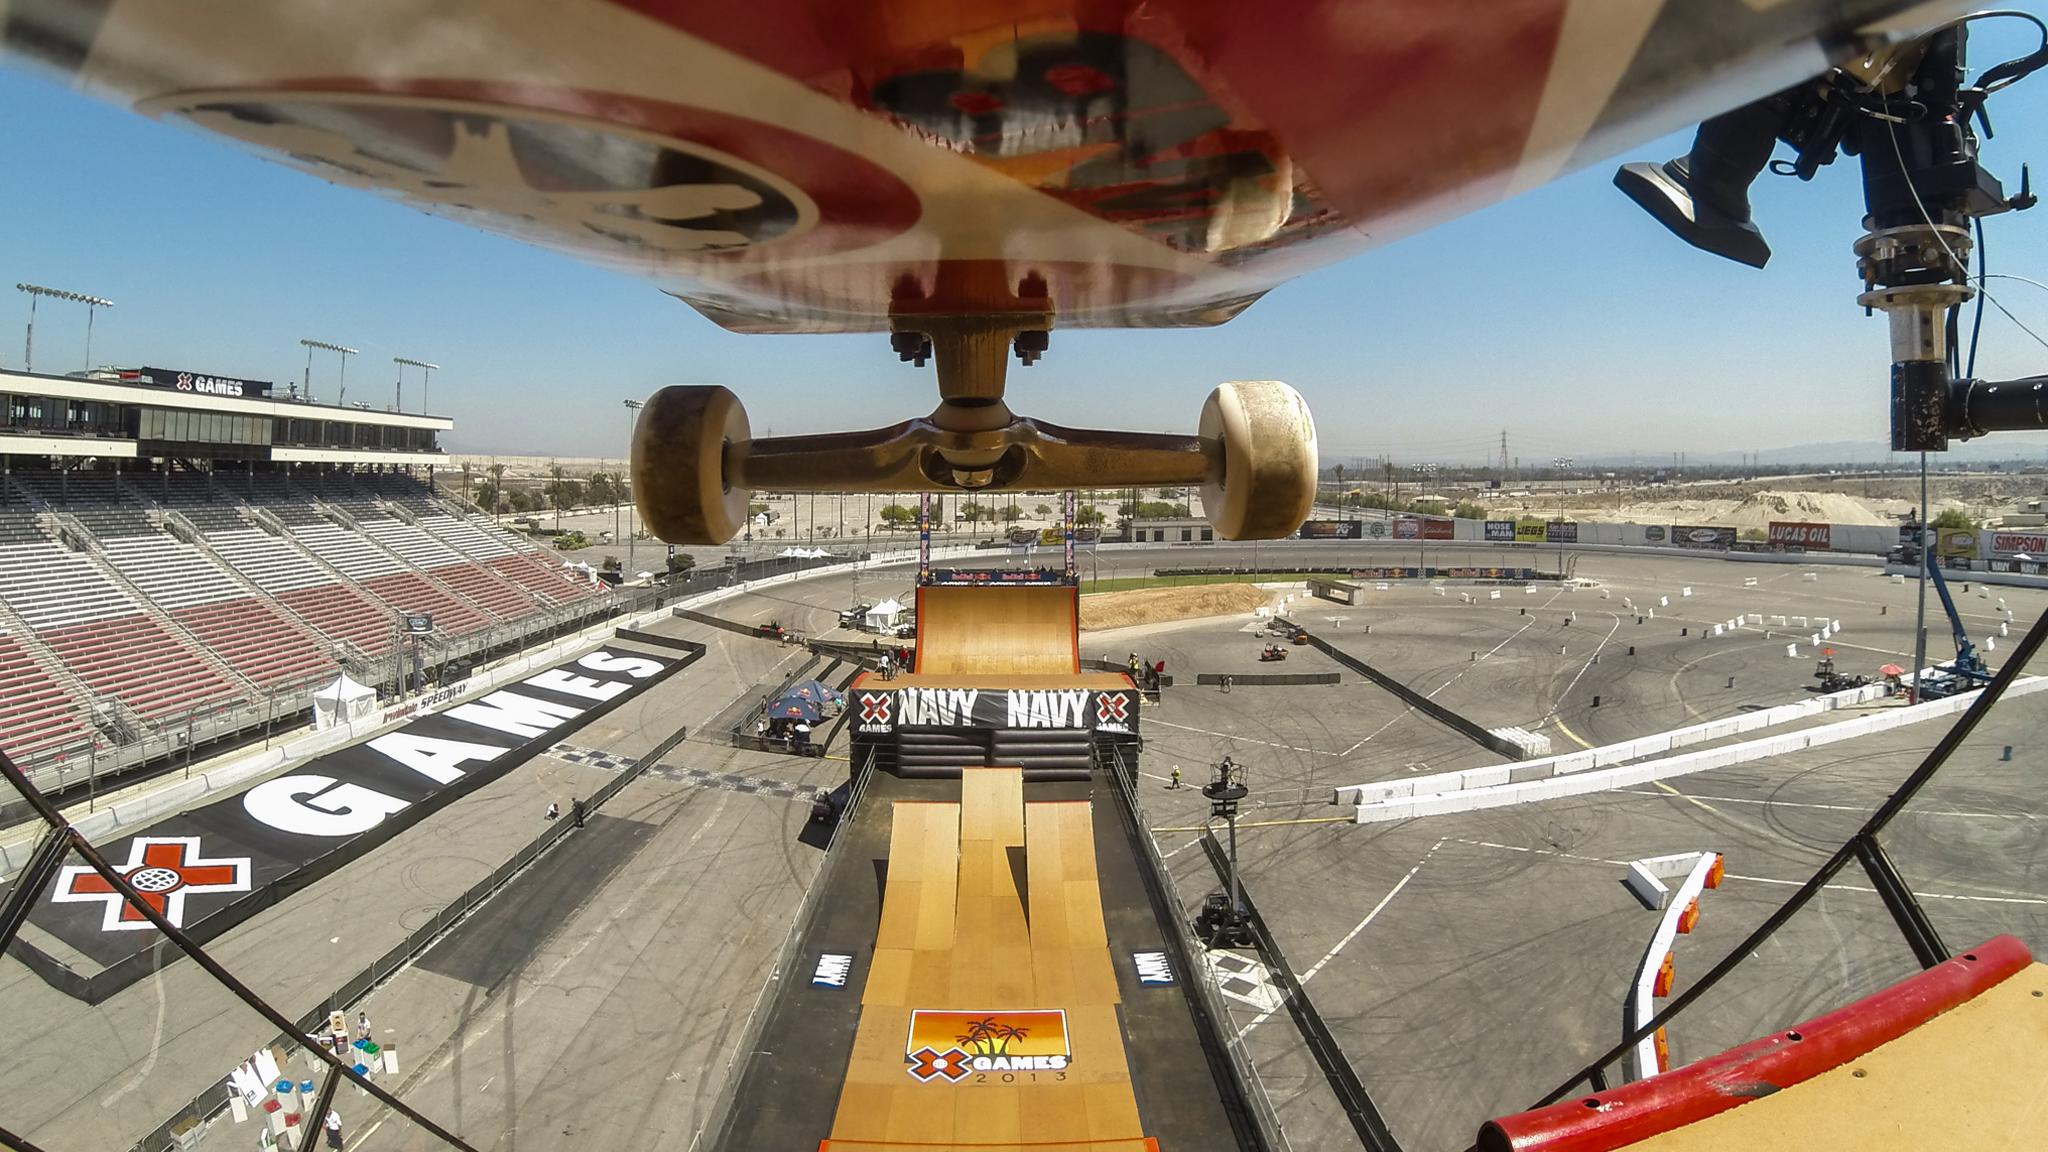 Eaton: Skateboard Big Air practice